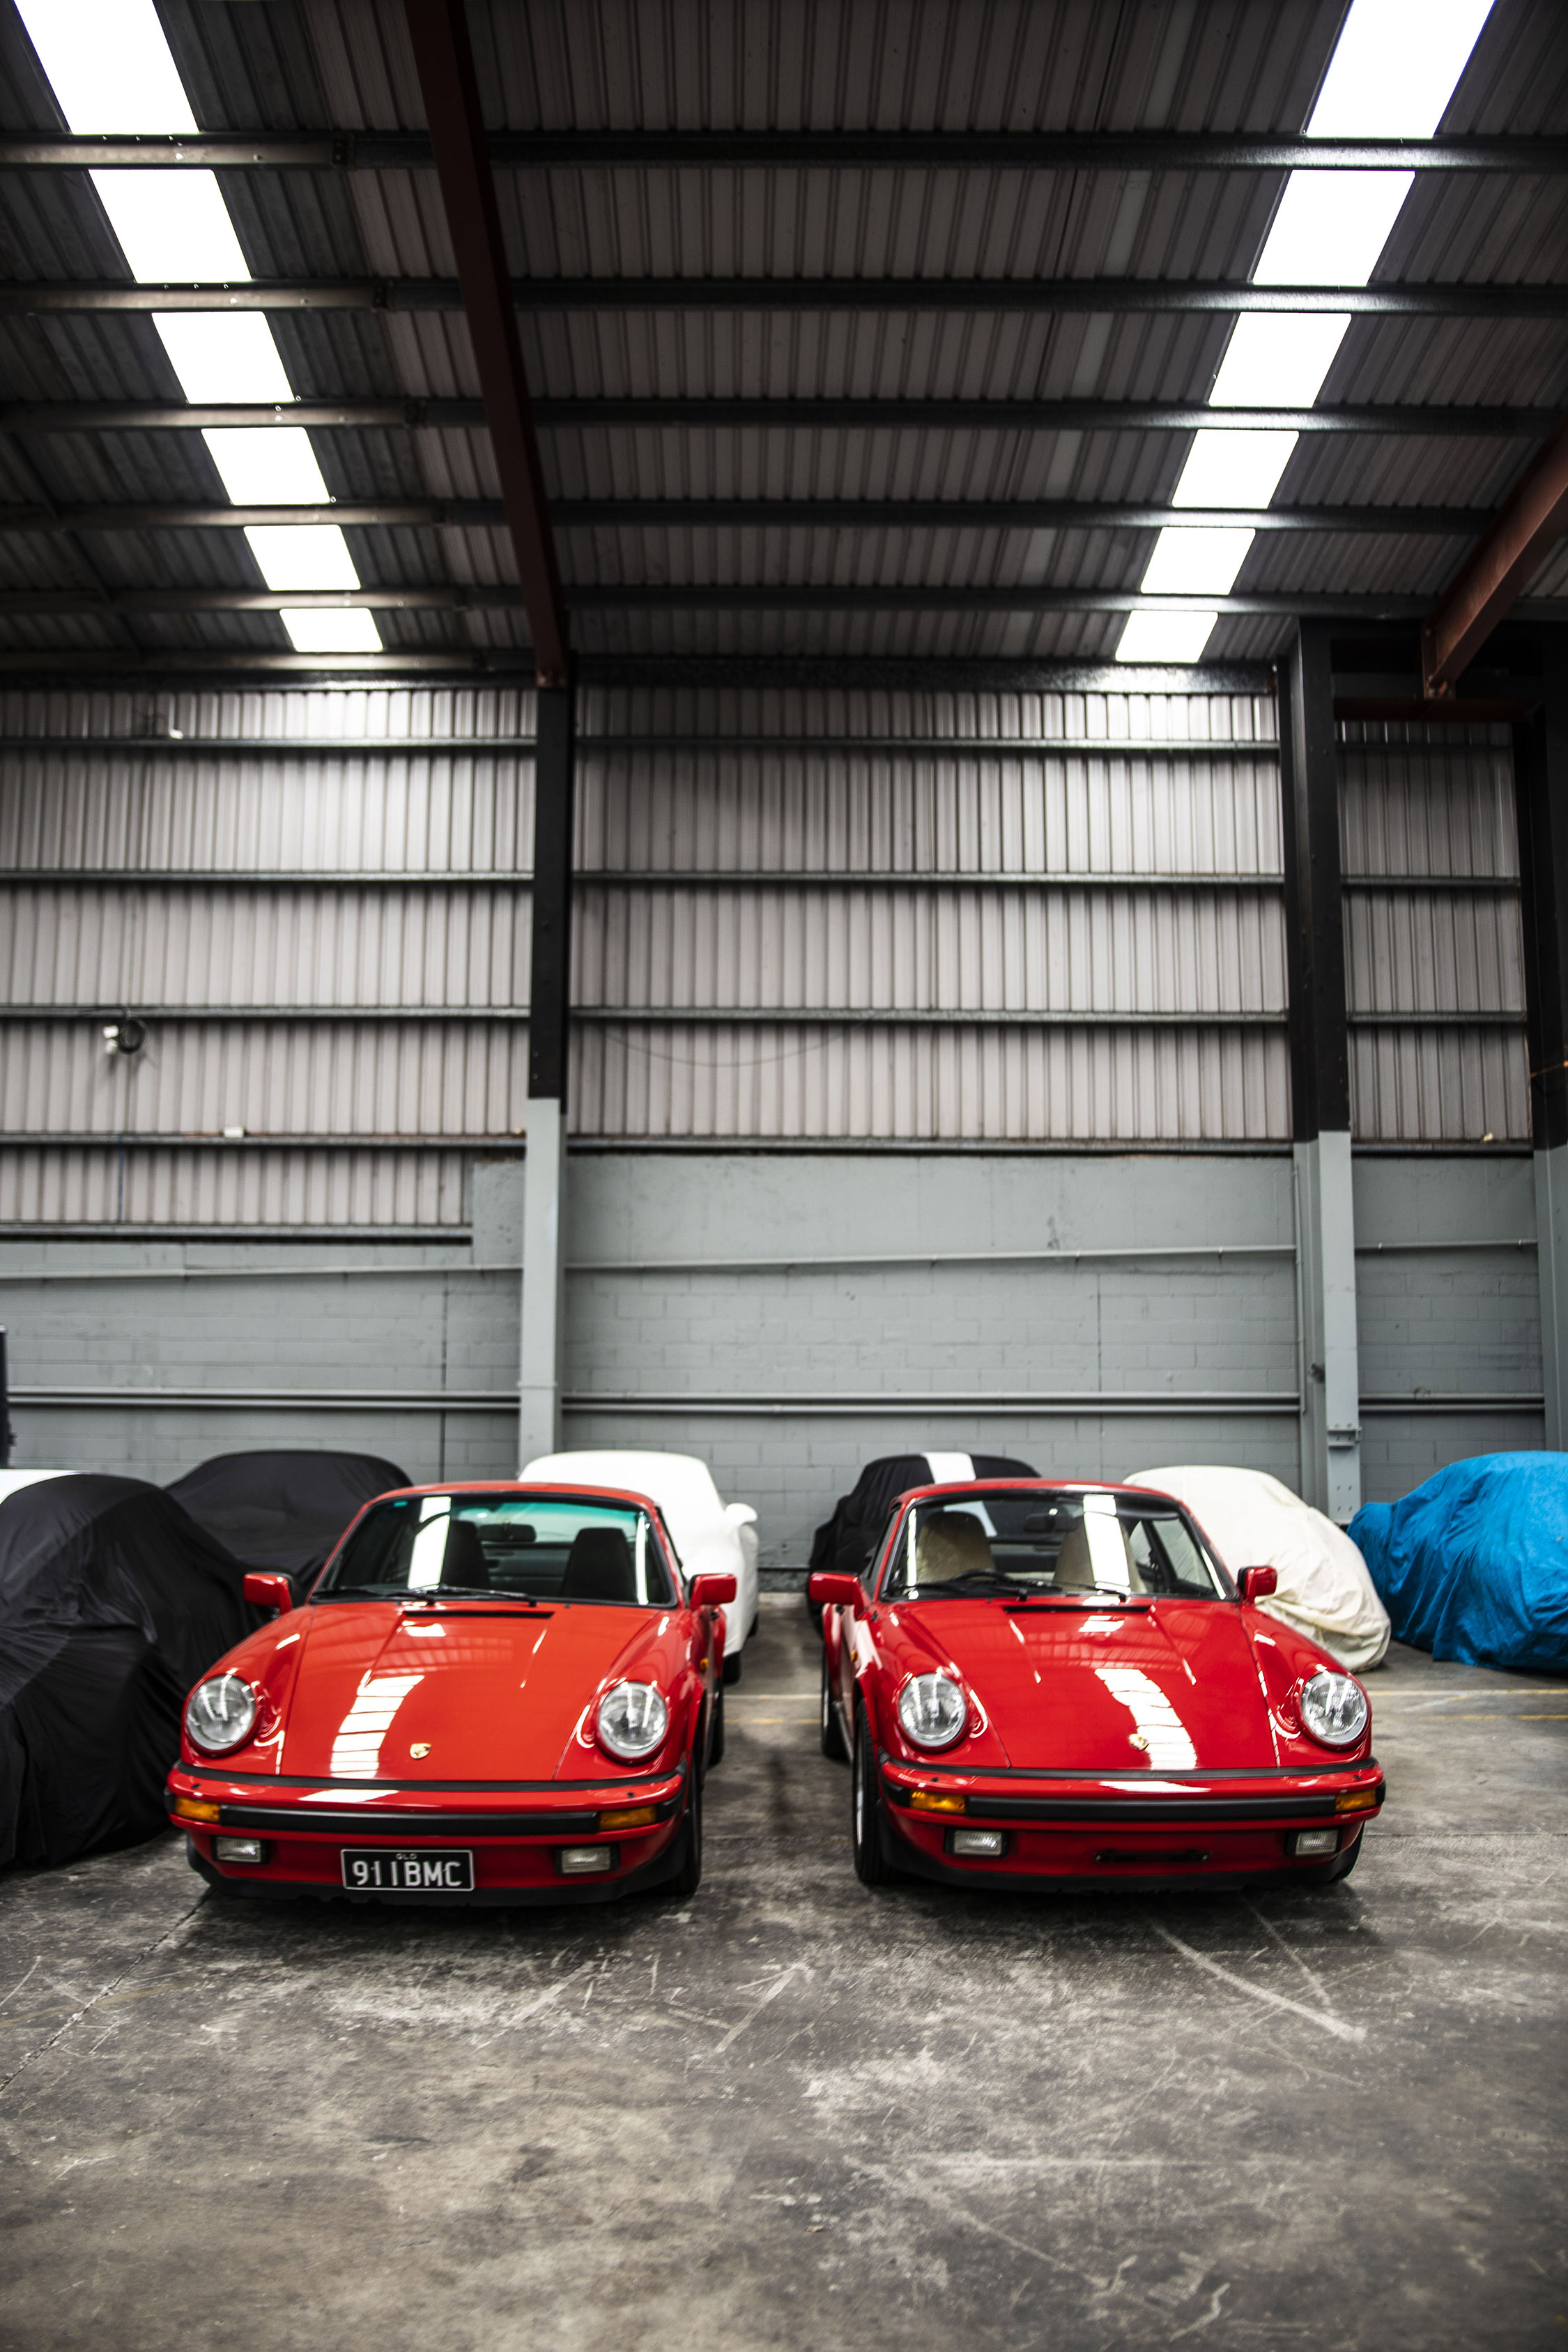 leon fitzpatrick porsche 911 autogoles storage cars and coffee